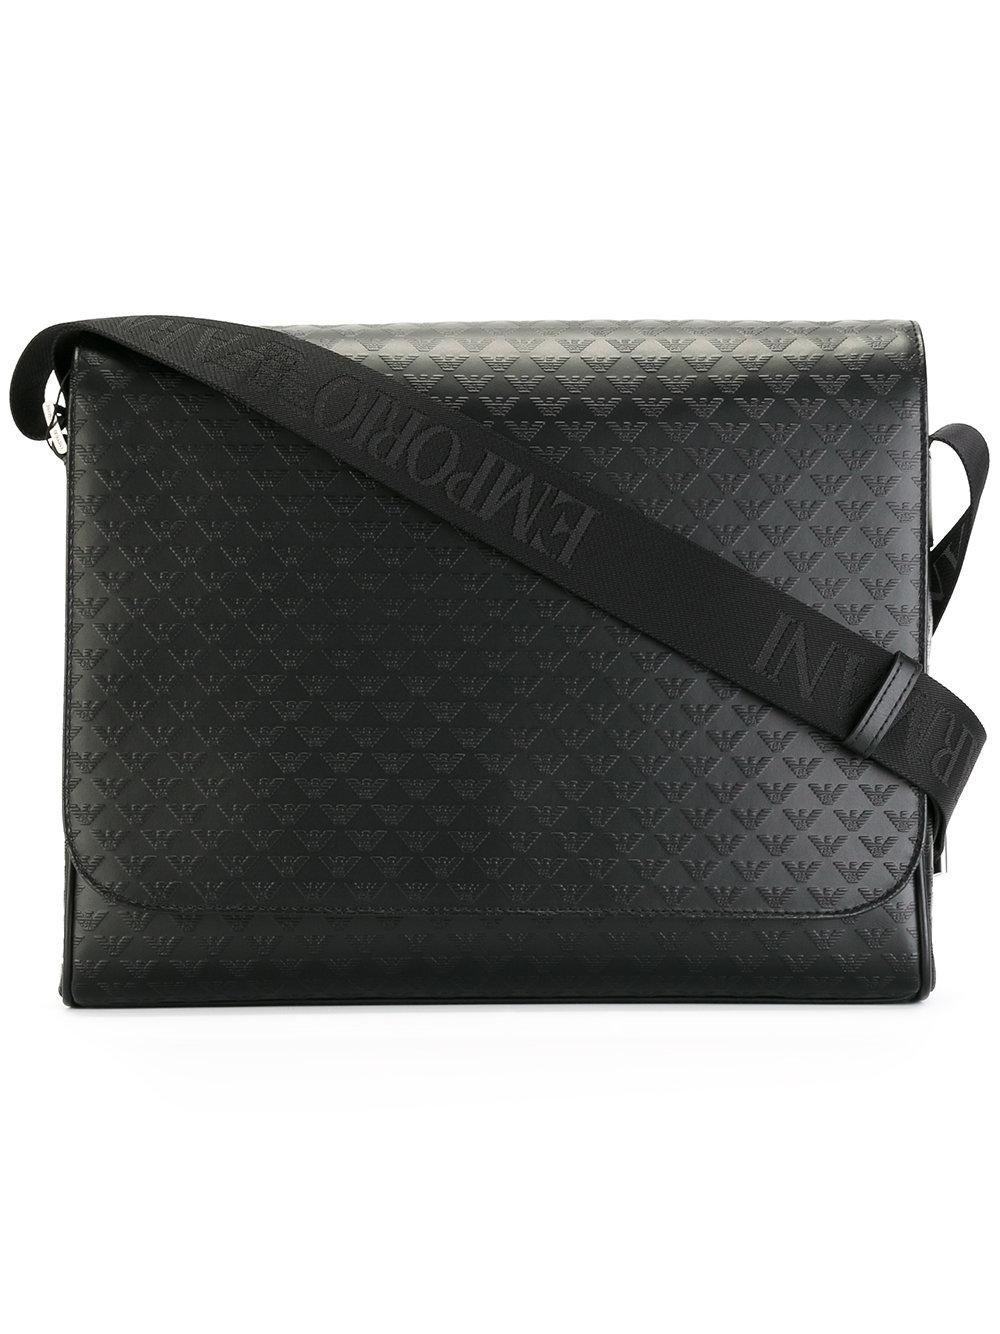 Lyst Emporio Armani Messenger Bag In Black For Men